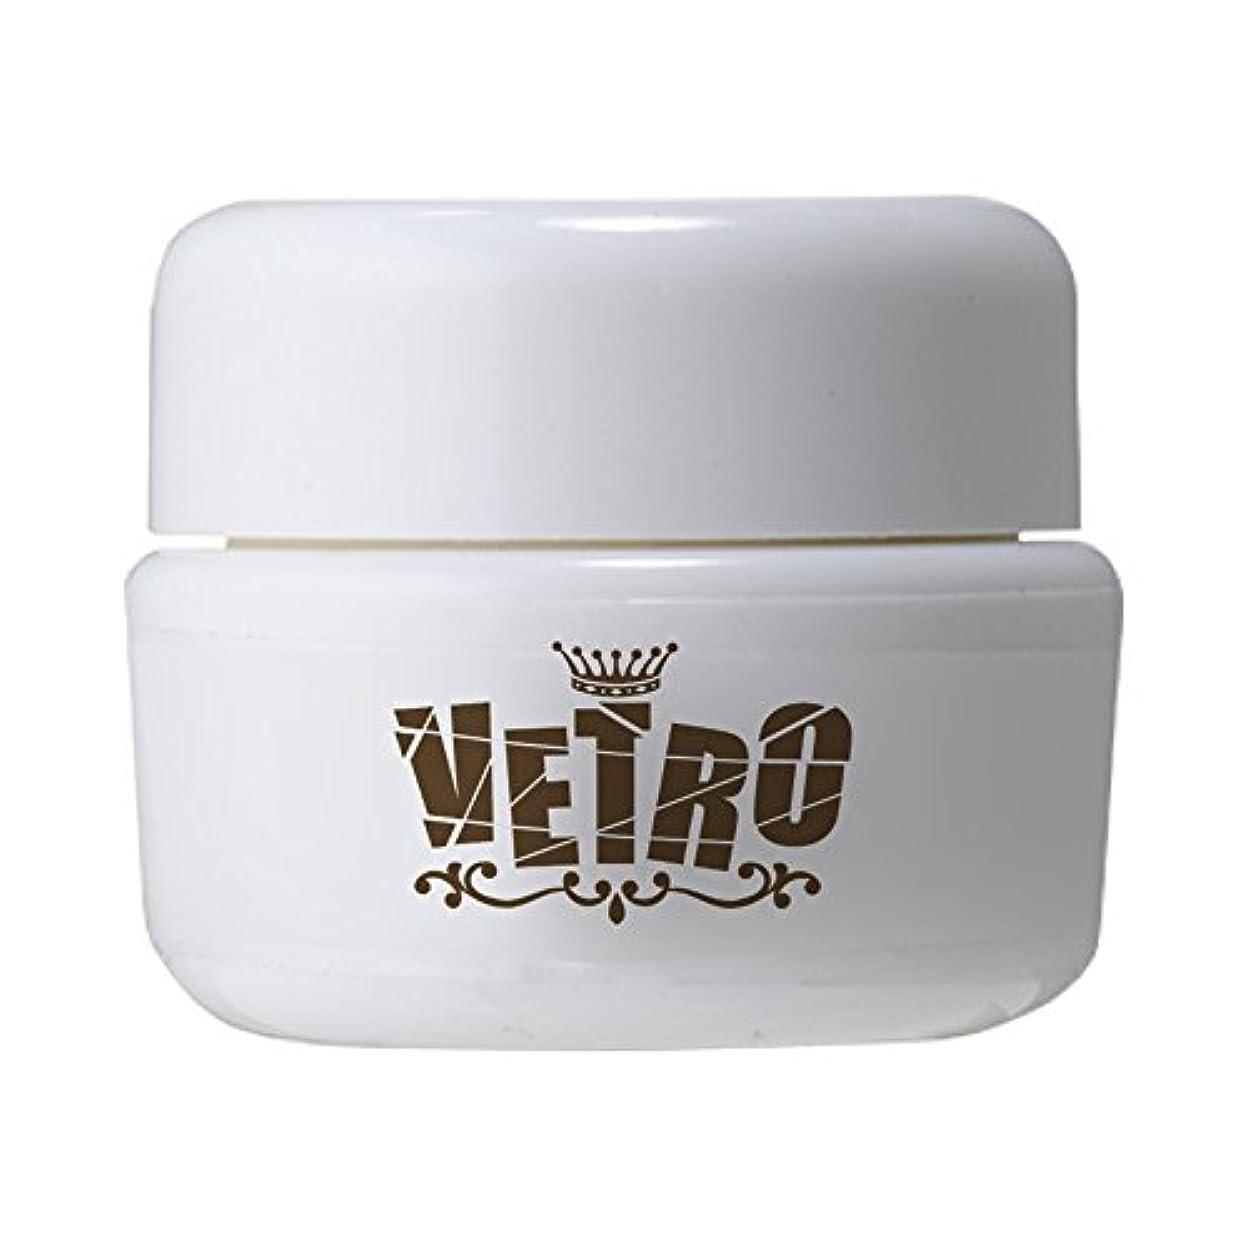 VETRO カラージェル VL342 マドモアゼル 4ml UV/LED対応 ソークオフジェル マット ヌードダークピンク